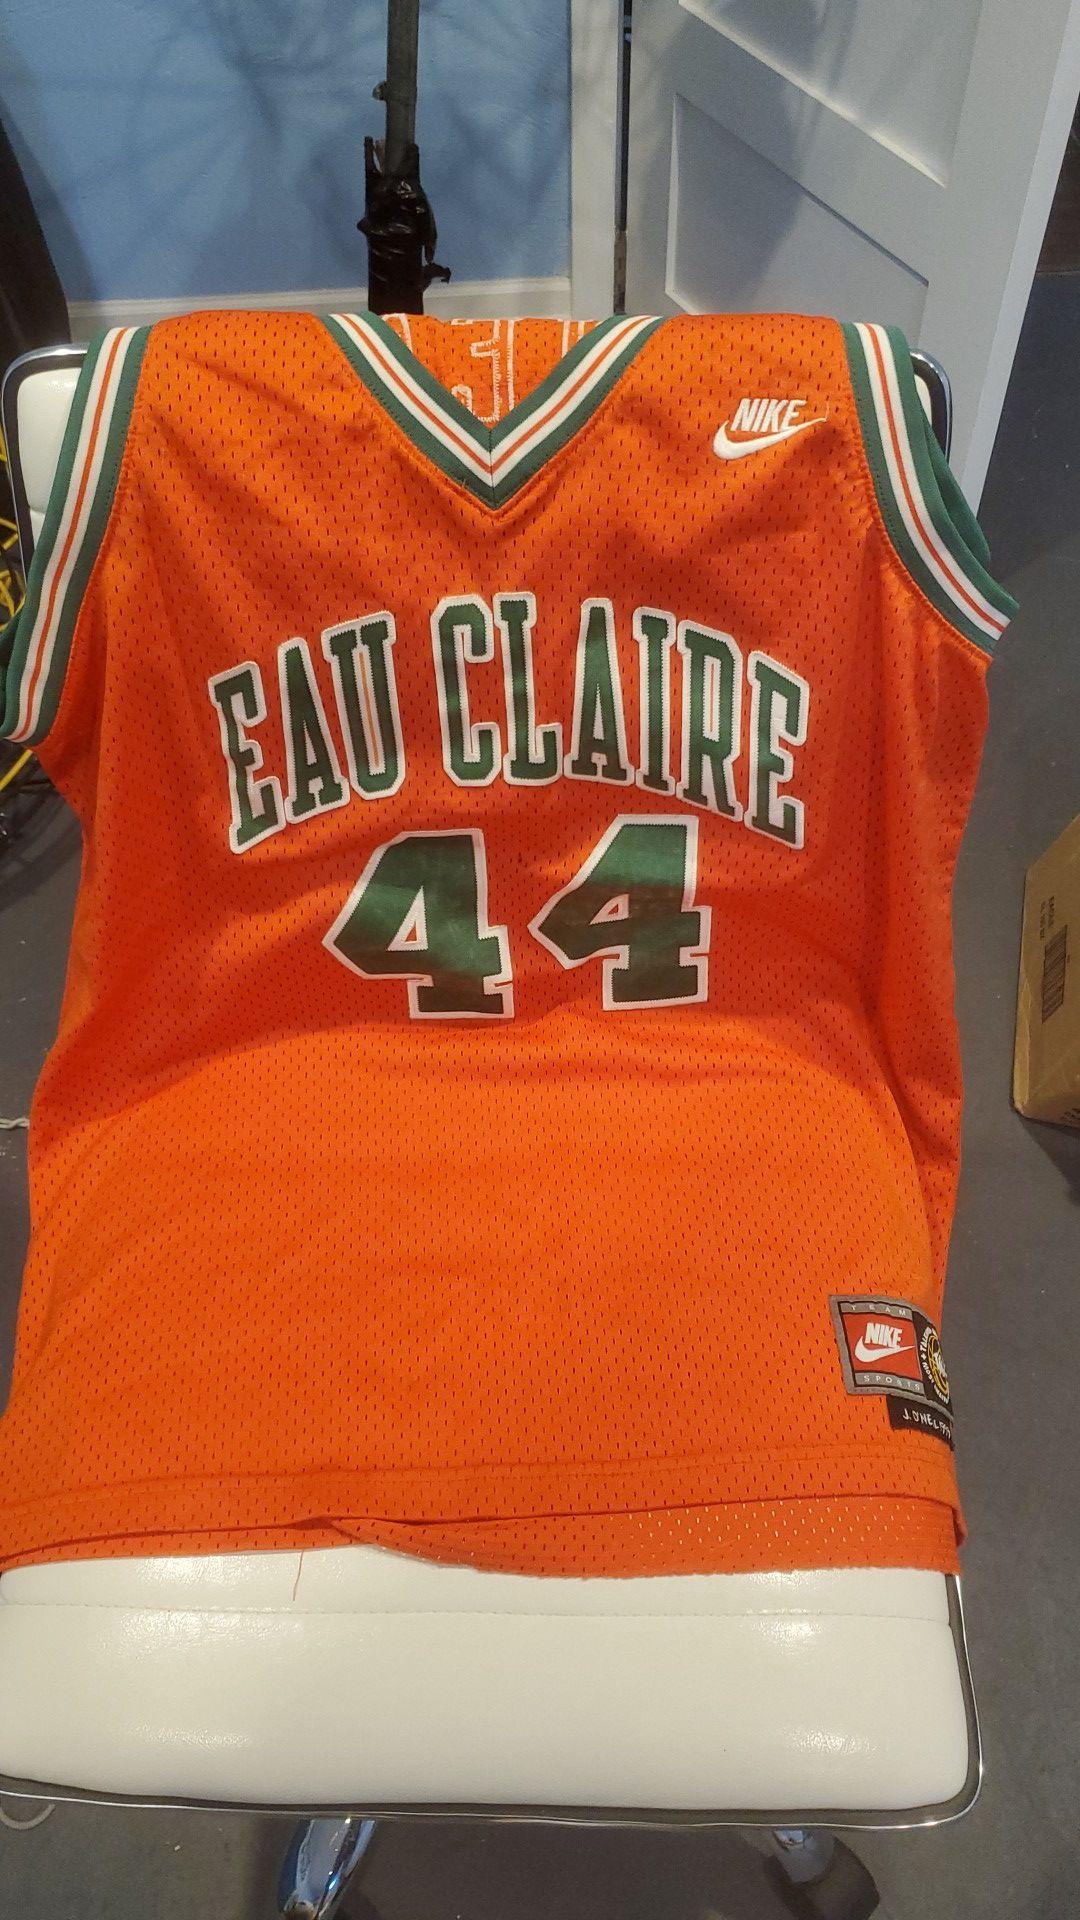 Jermaine O'Neal high school jersey